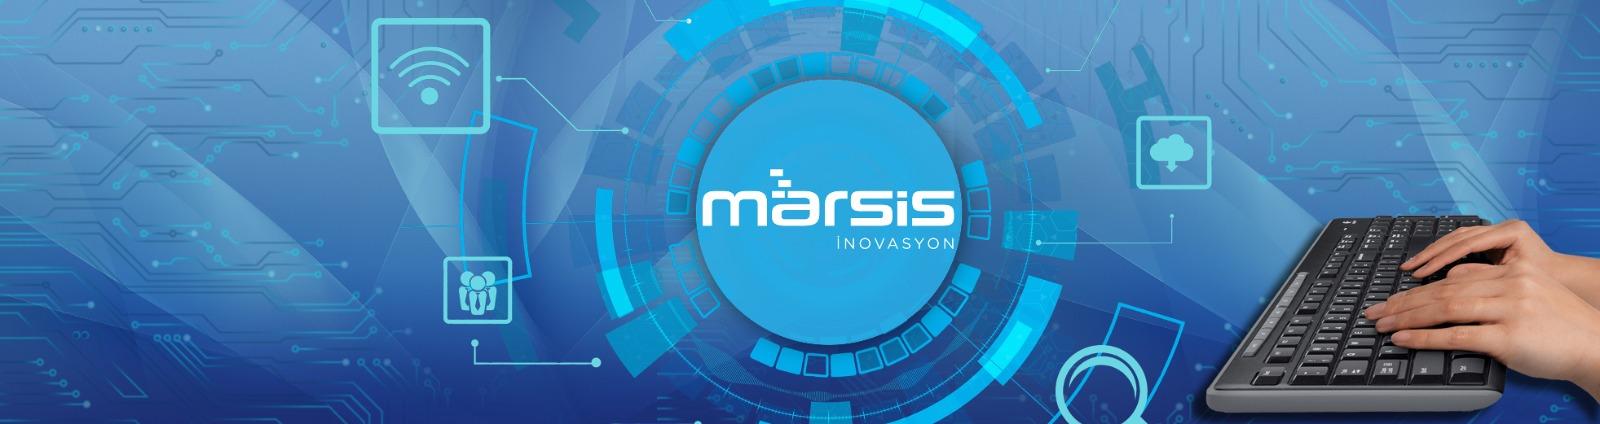 marsis-inovasyon-tasarim